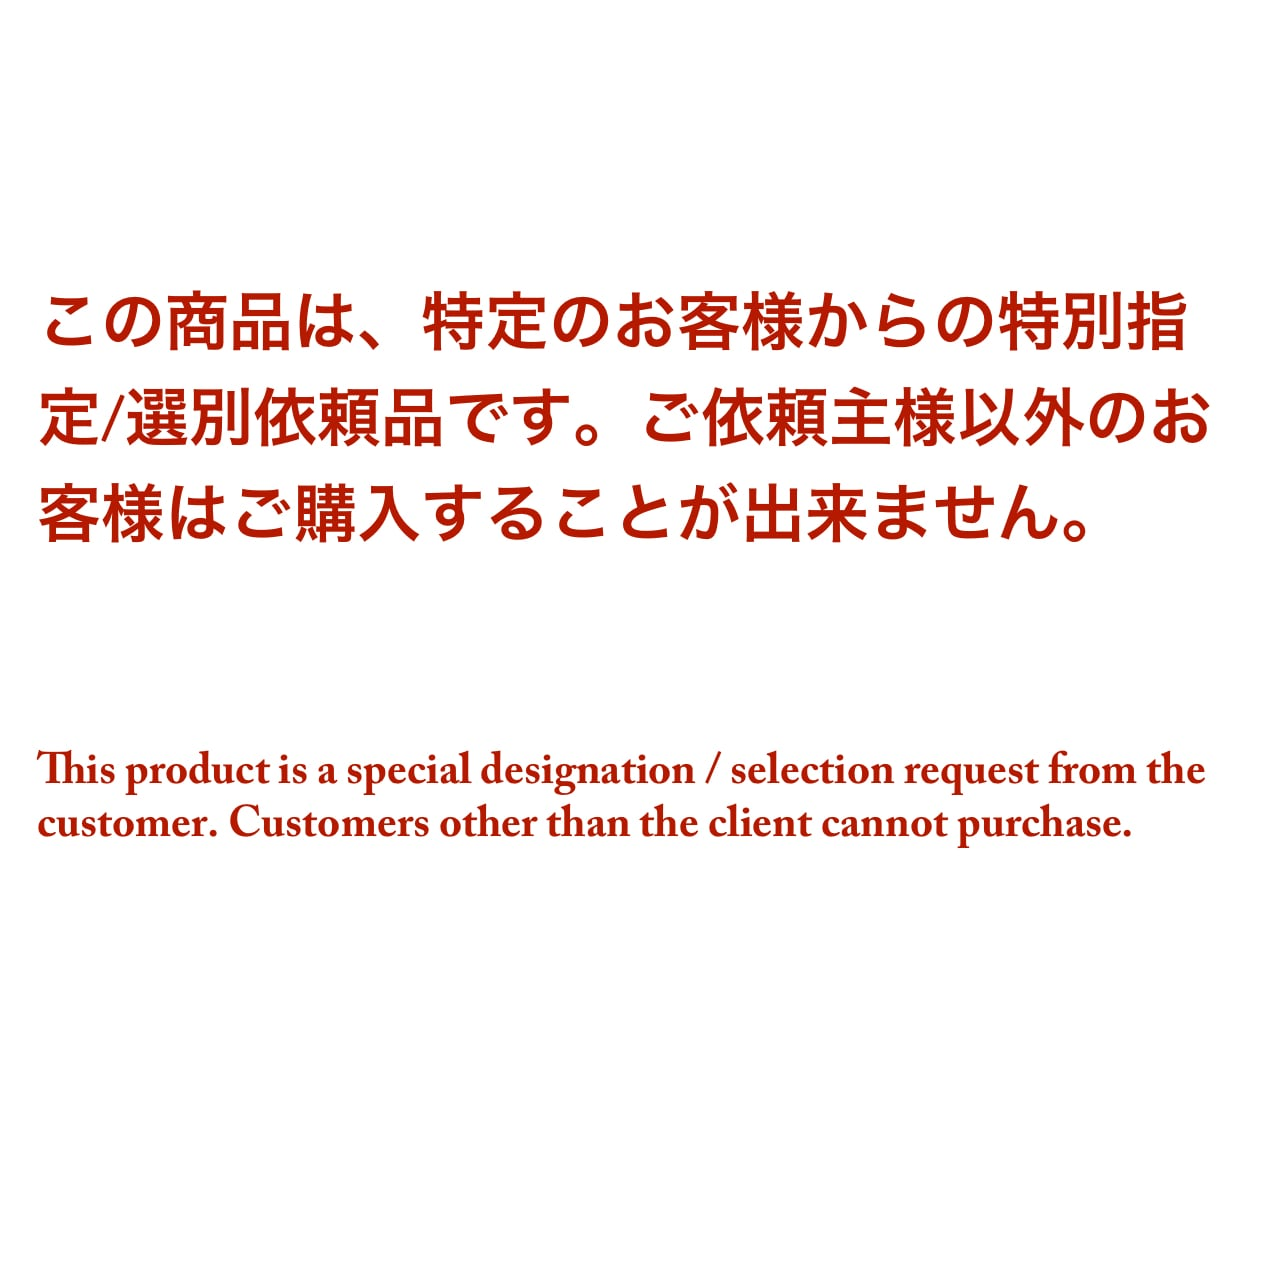 特定顧客商品YN20210428